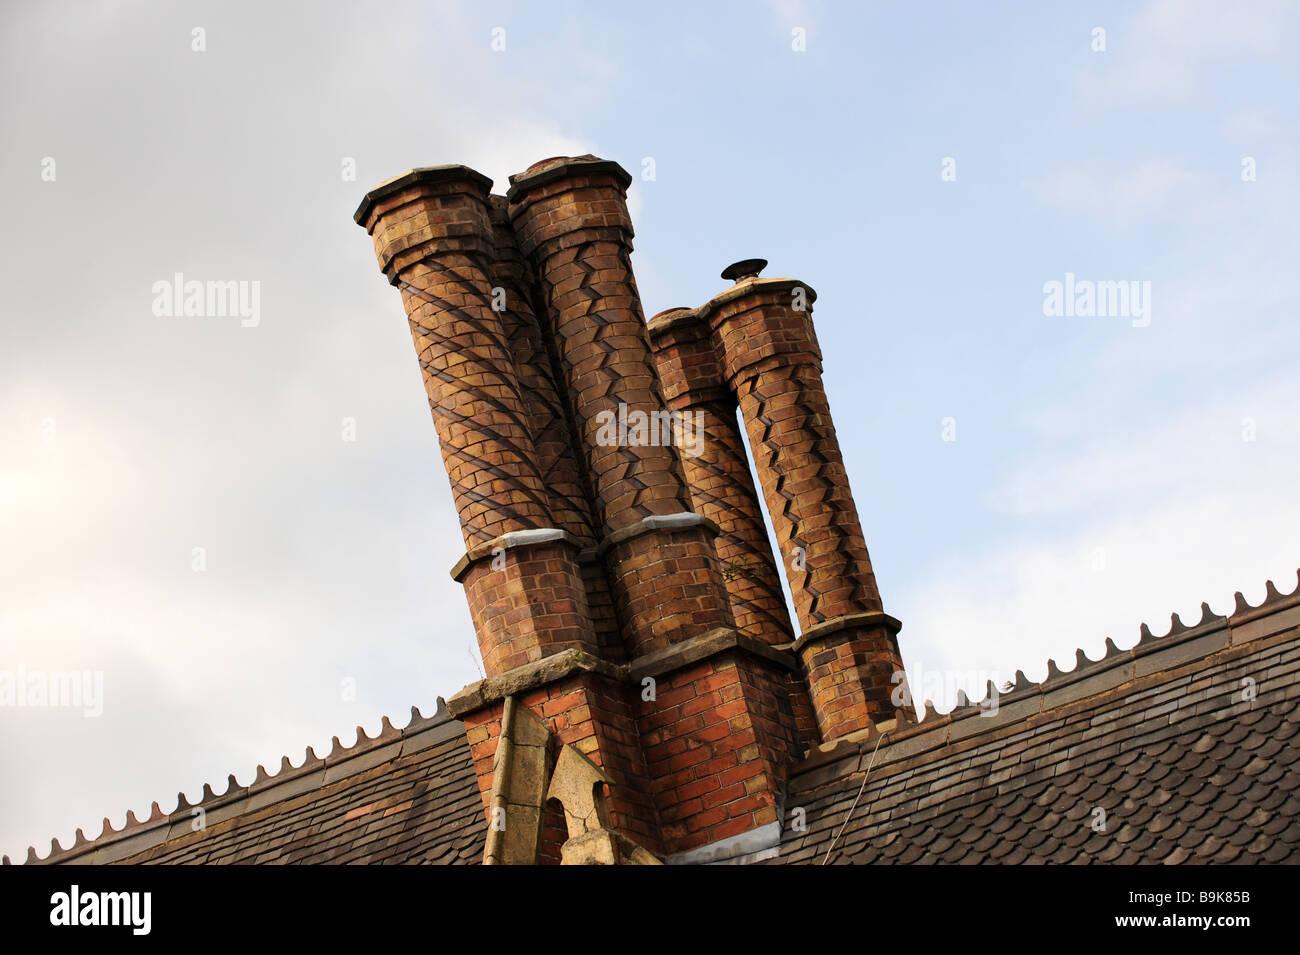 Decorative Chimney Stacks With Spiral Effect In Ironbridge Shropshire  England Uk